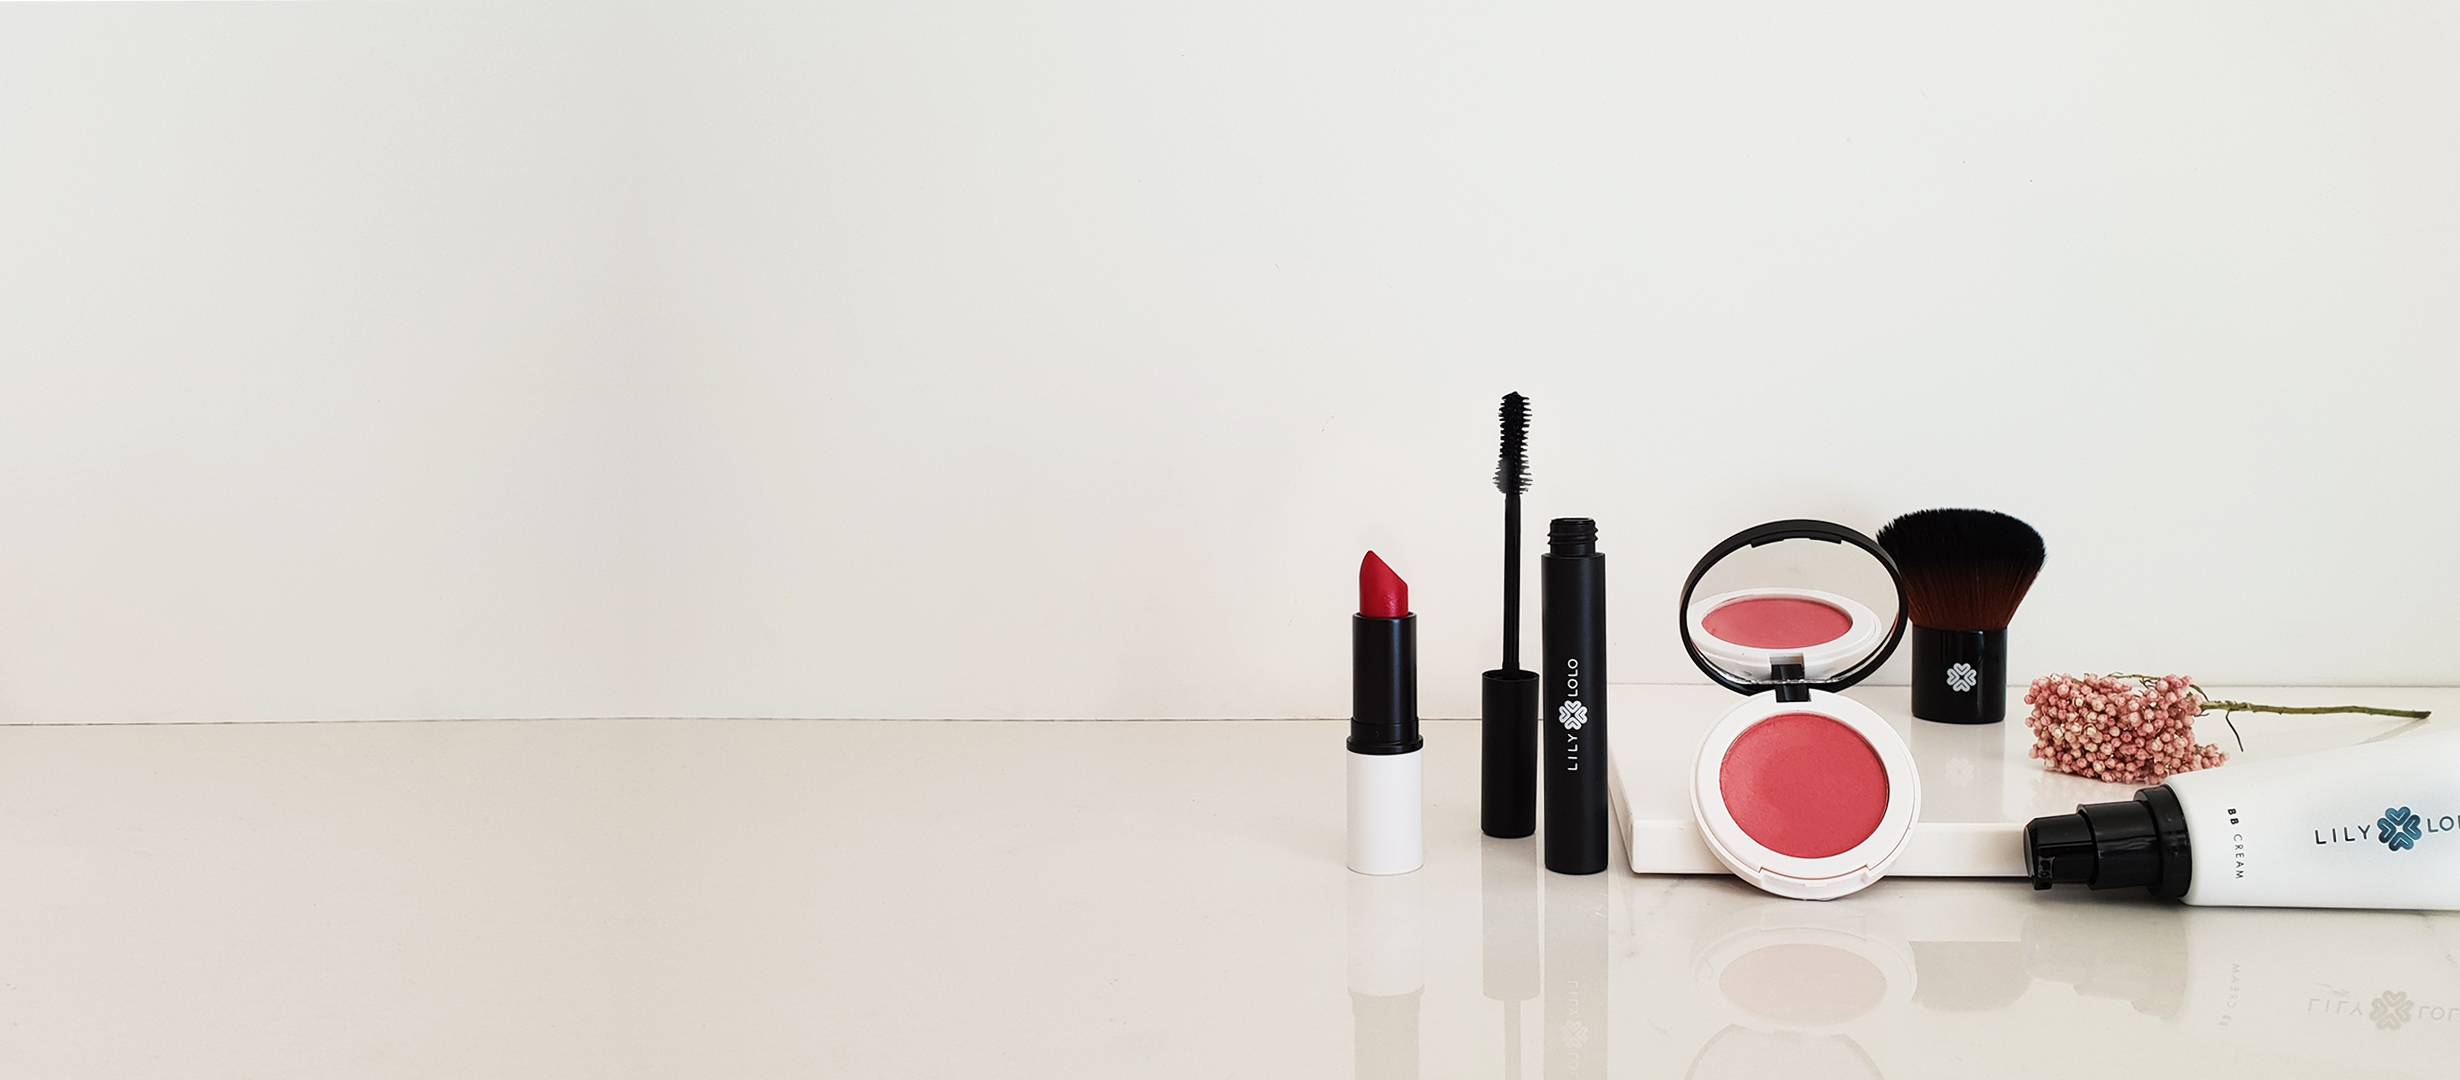 maquillage bio et minéral mademoiselle biloba